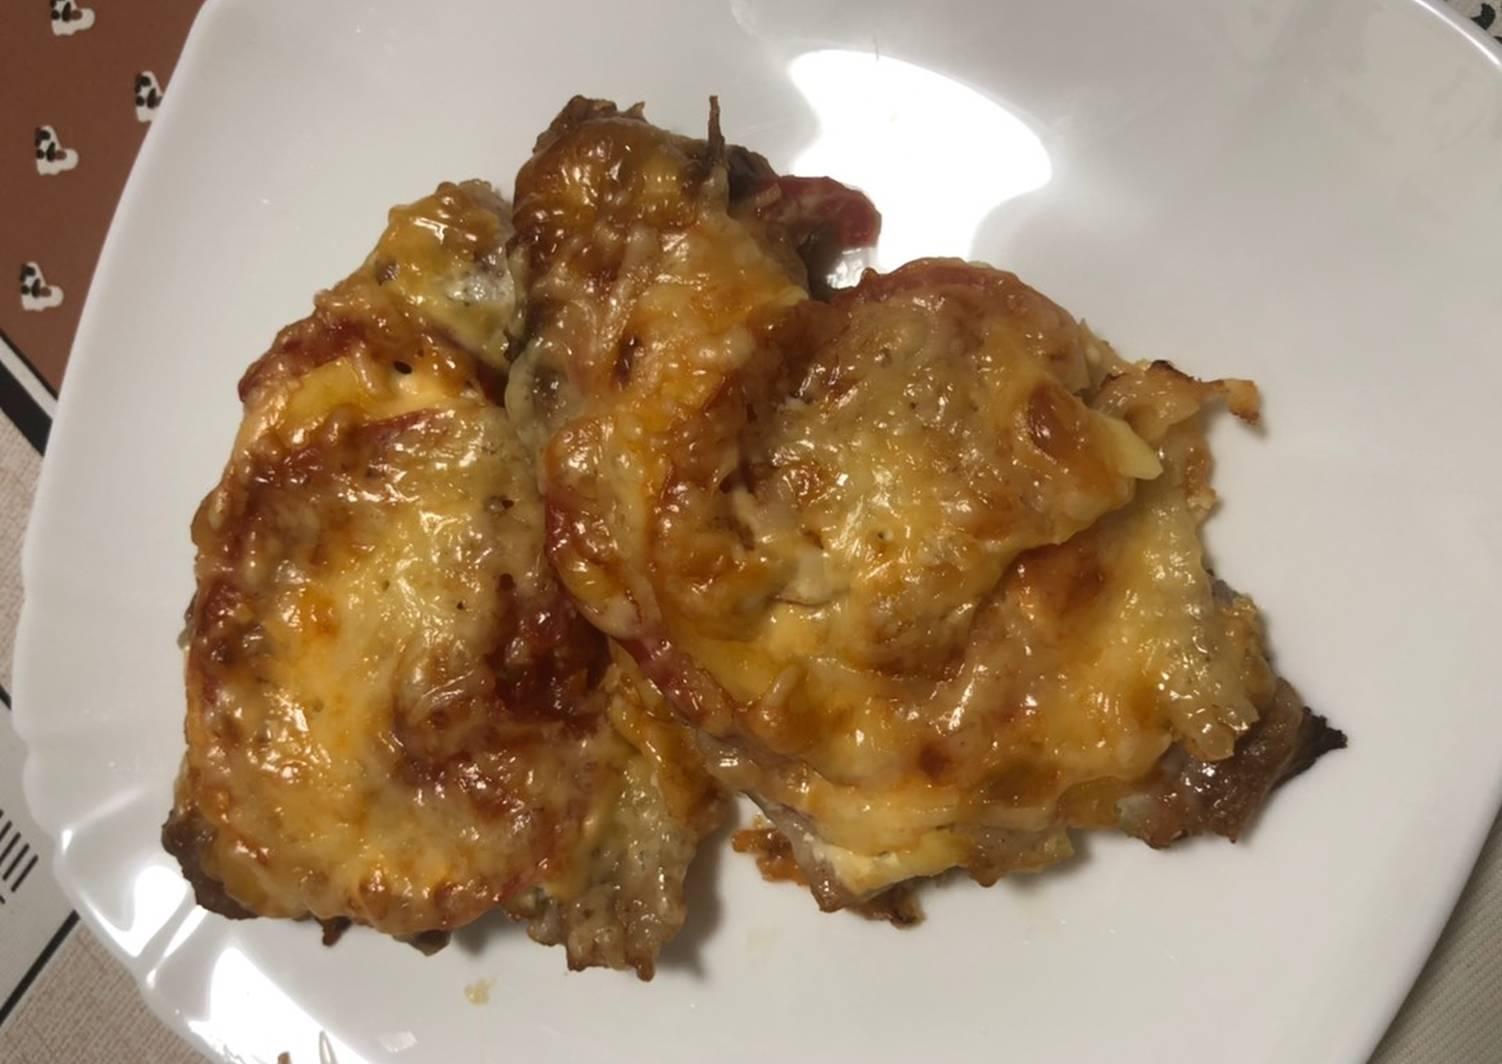 мясо по мулянски рецепт с фото пошагово нашем сайте найдёте